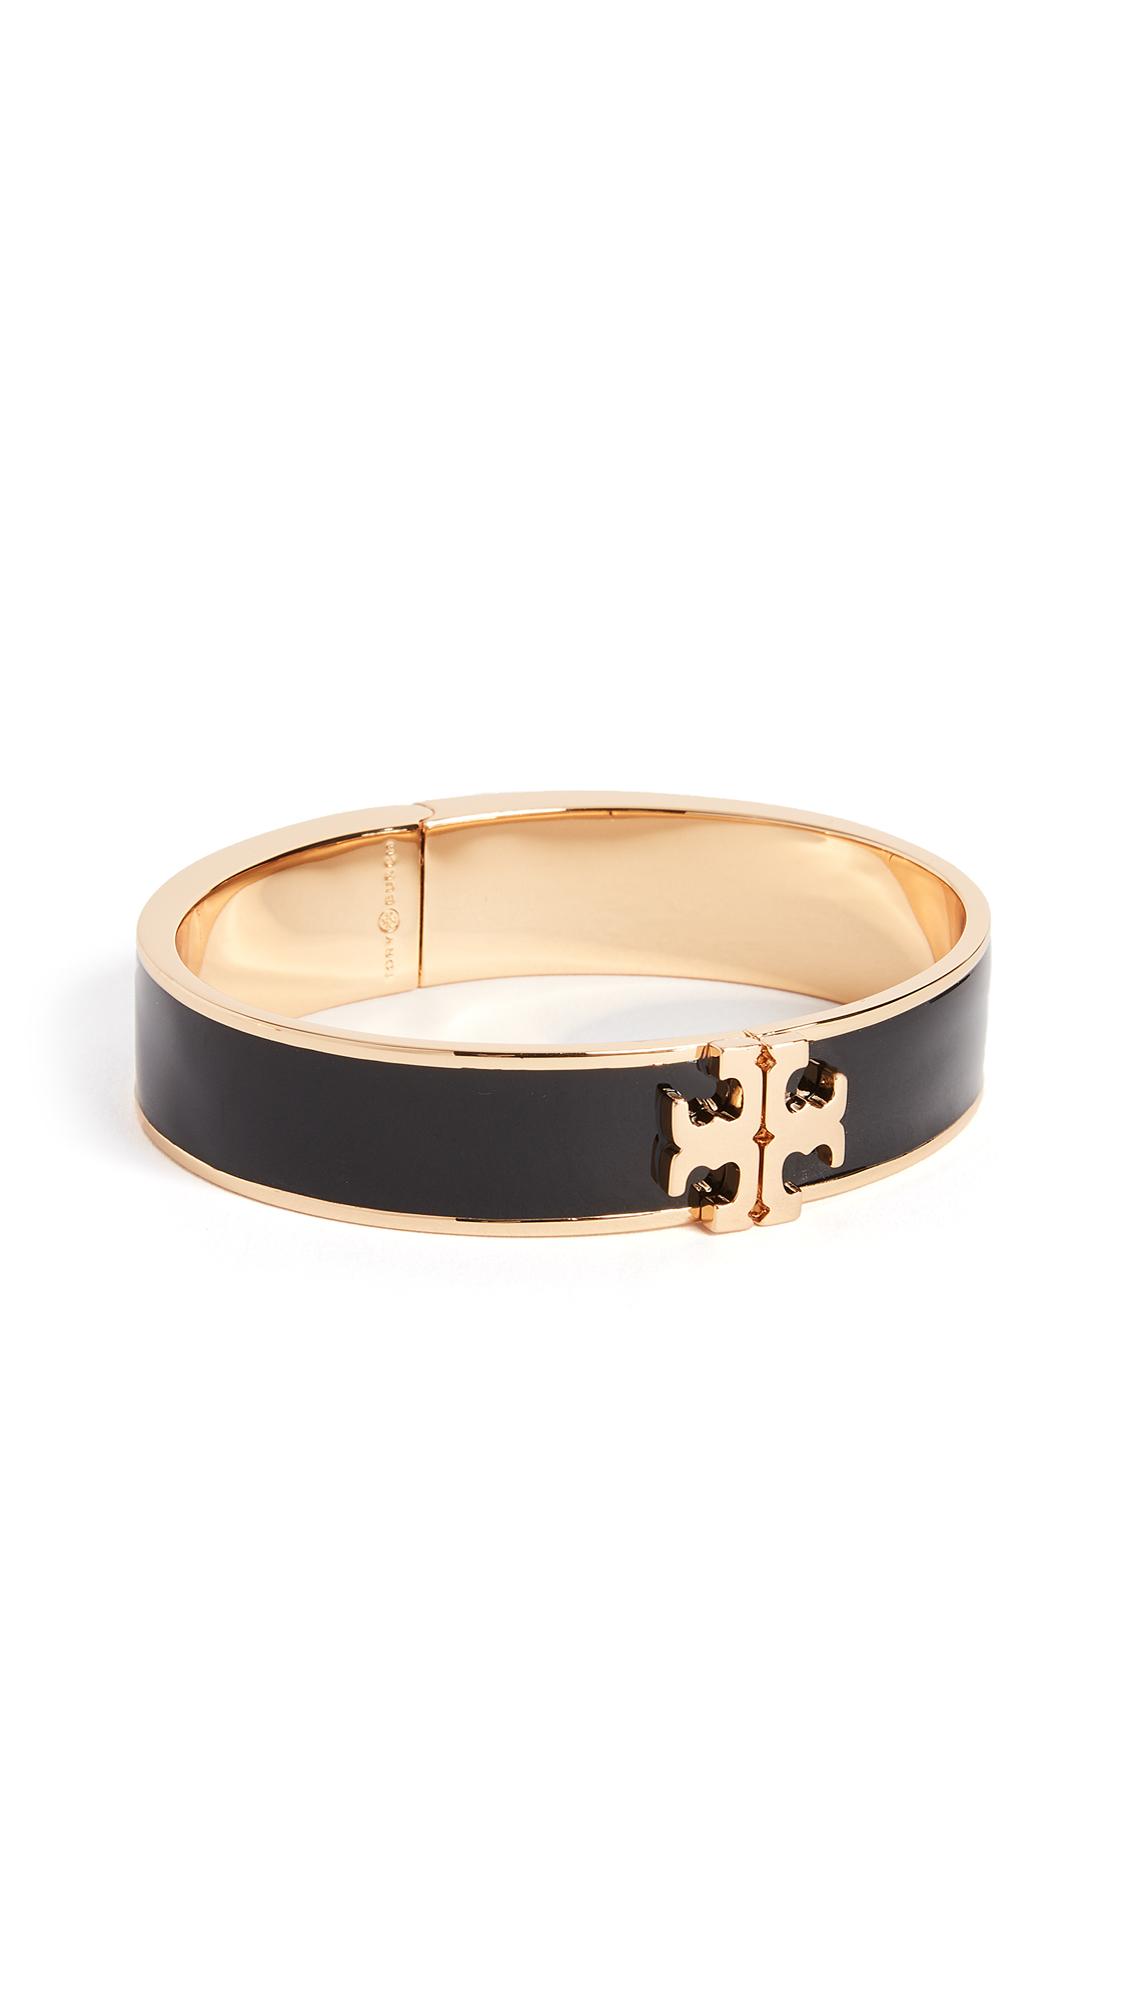 Tory Burch Logo Thin Enamel Hinged Bracelet - Black/Gold